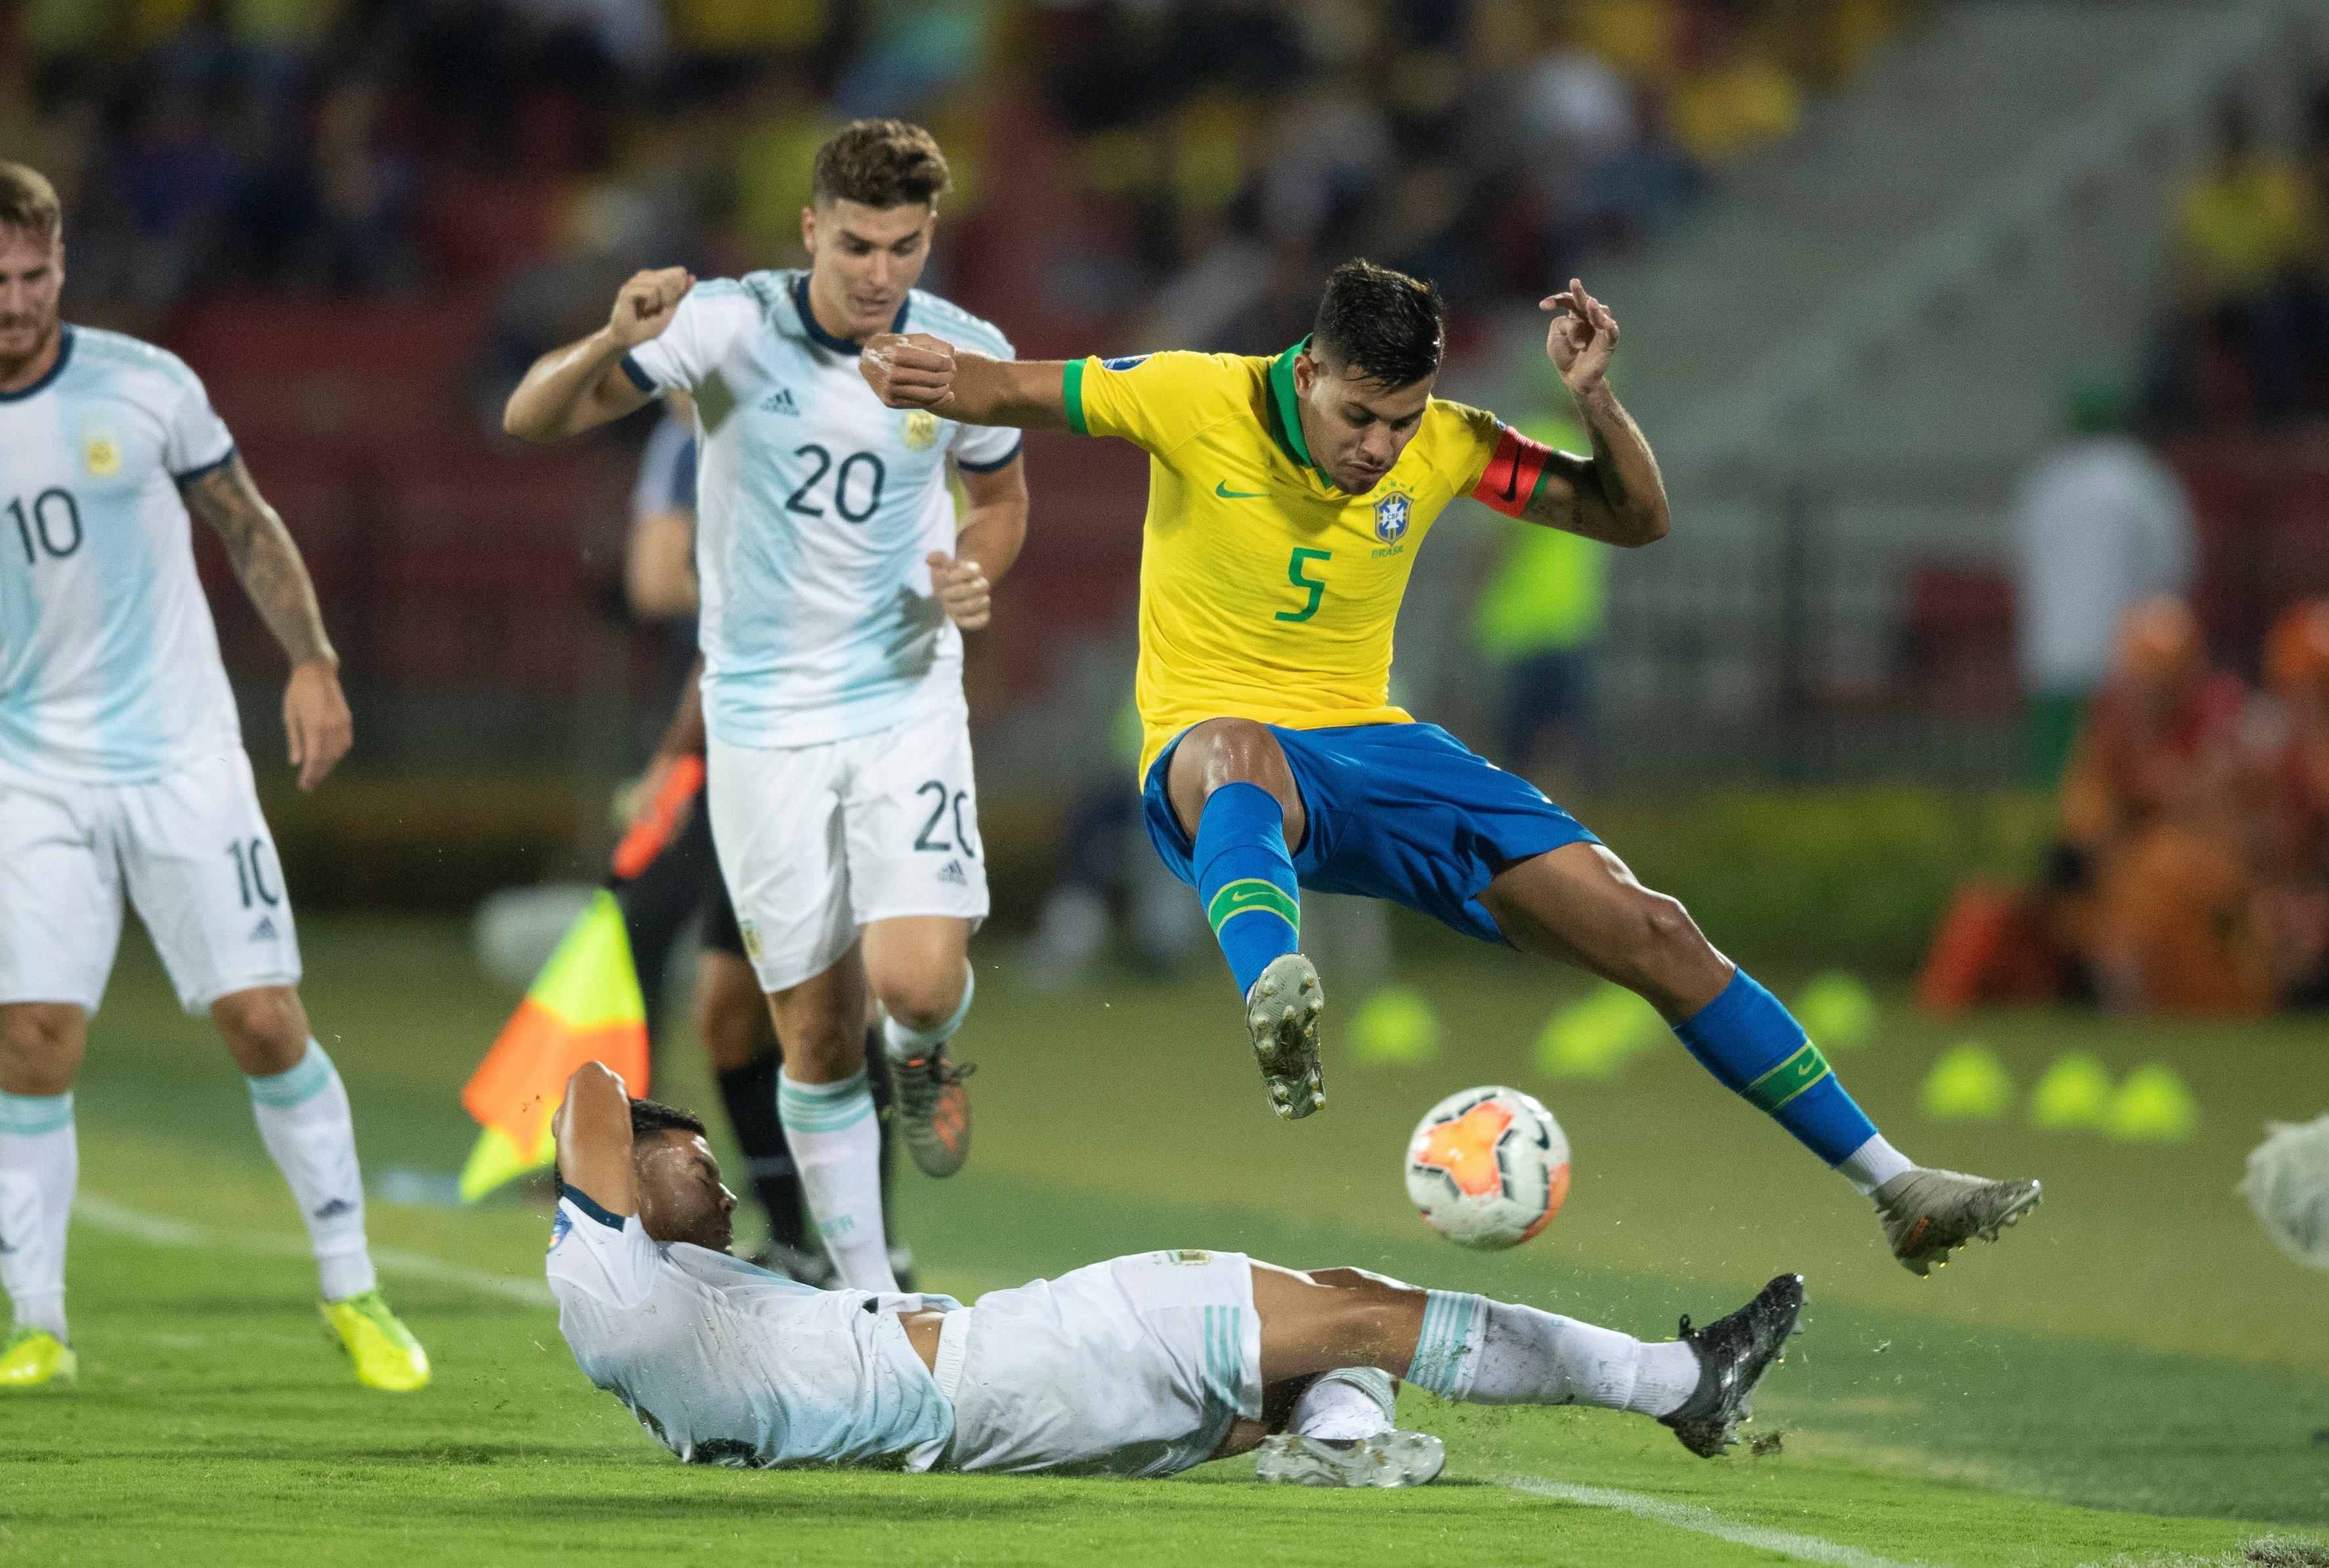 Бразилия - Аргентина, отбор на Олимпиаду